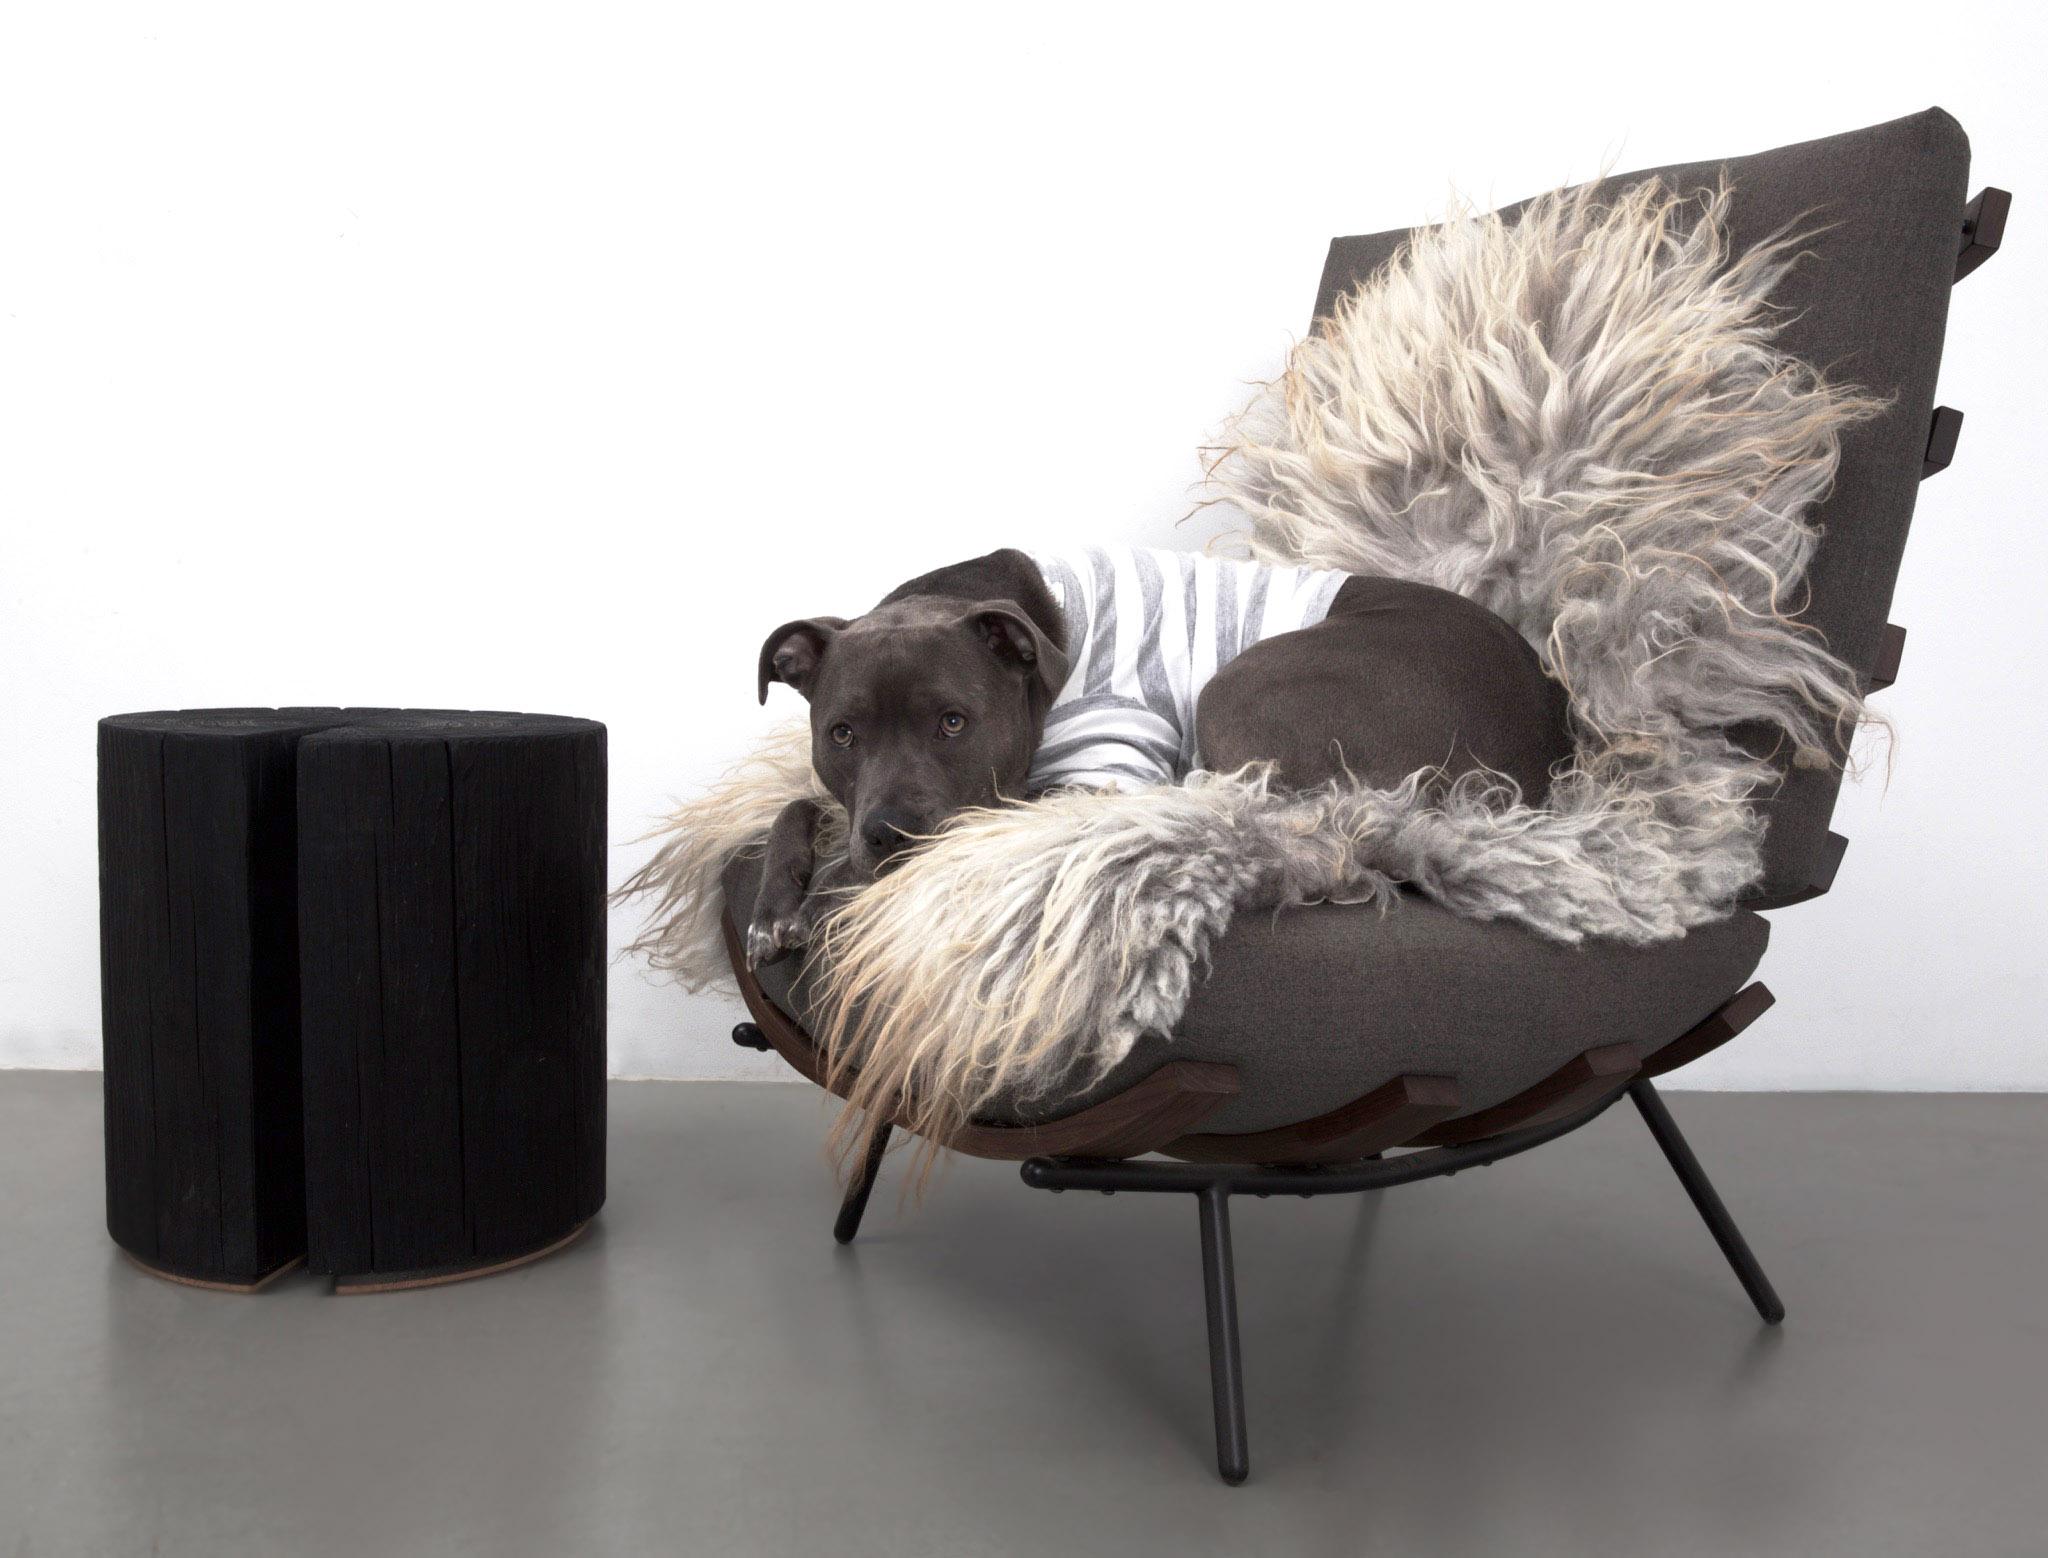 Rasta on UHURU Design's custom chair and Hono stool.